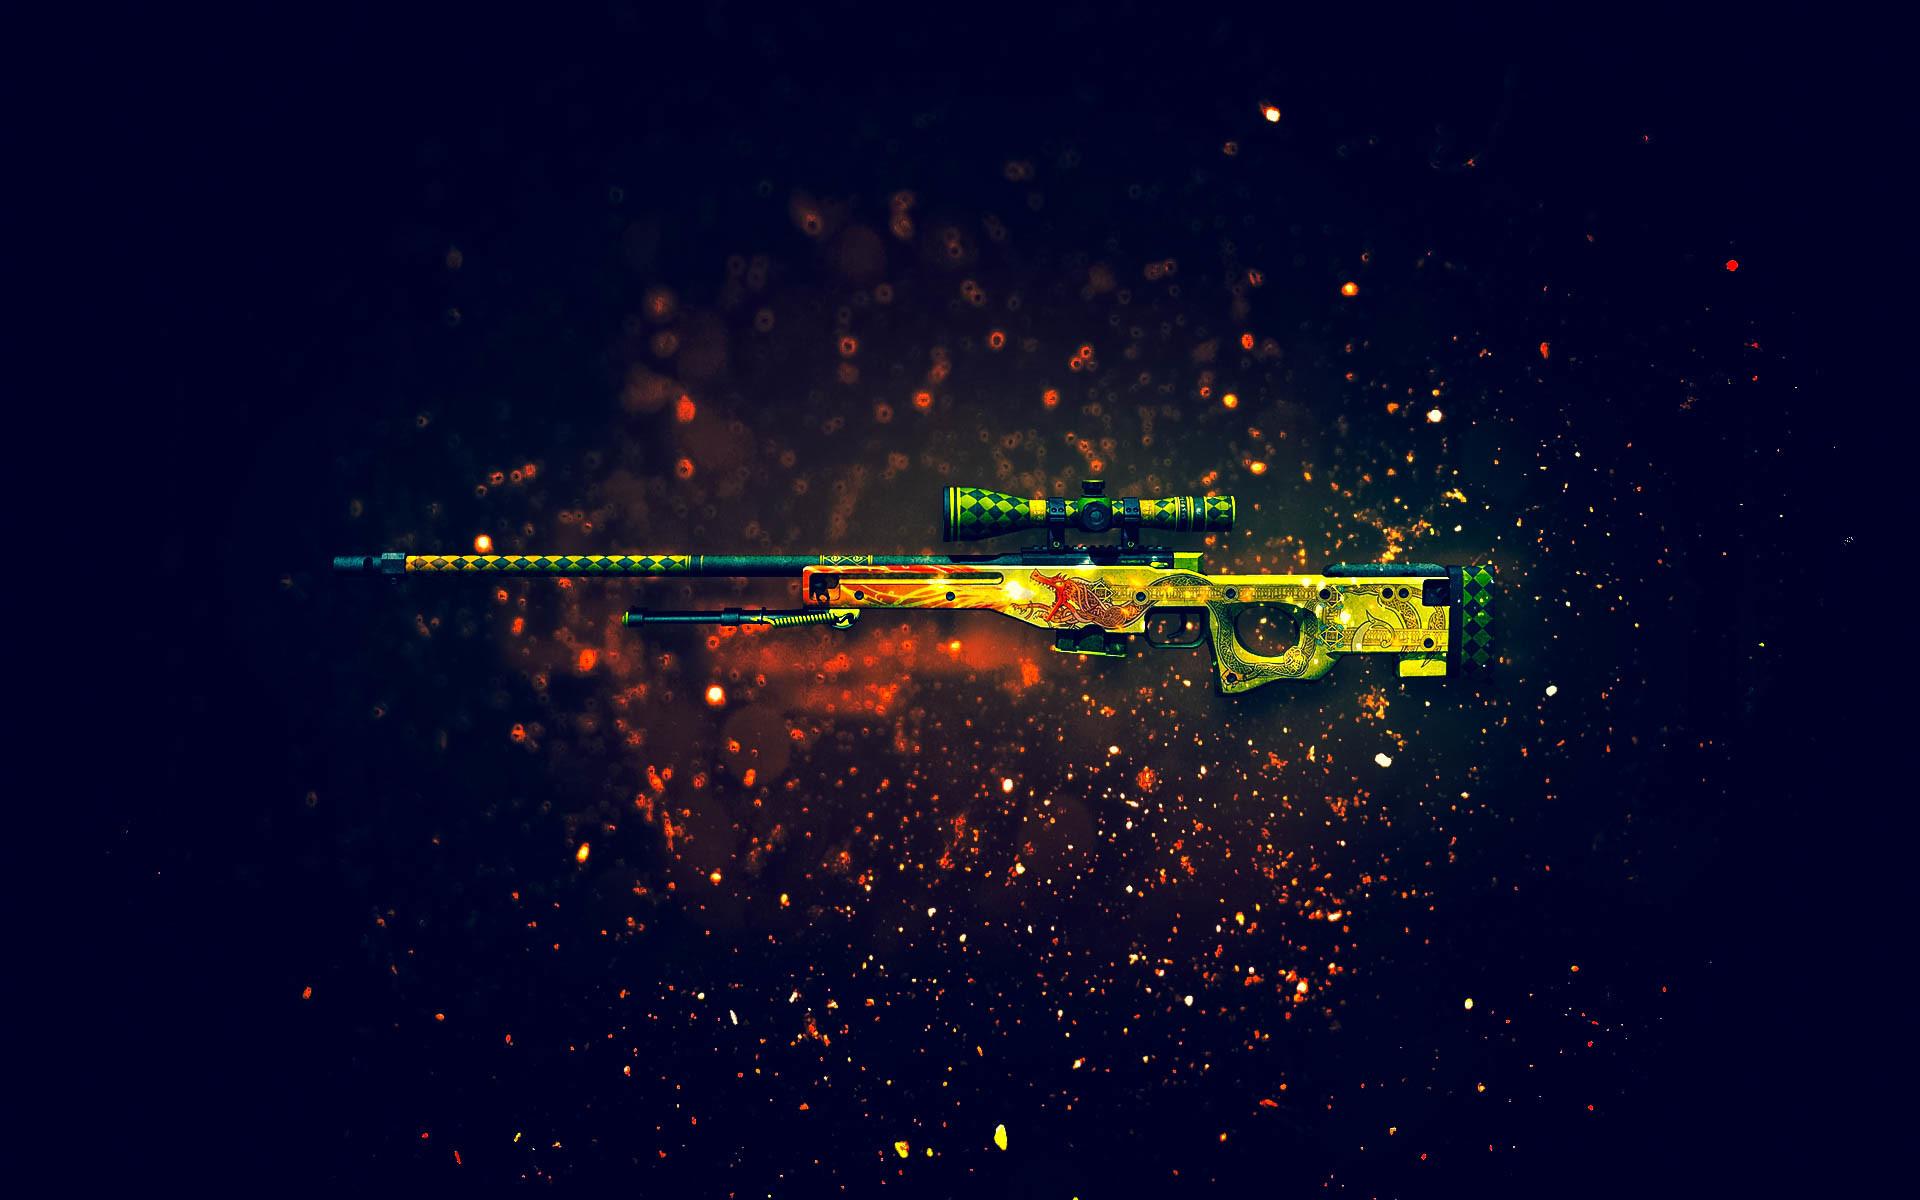 AK-47   Aquamarine Revange   CS:GO   Skins   Pinterest   AK 47 and Video  games